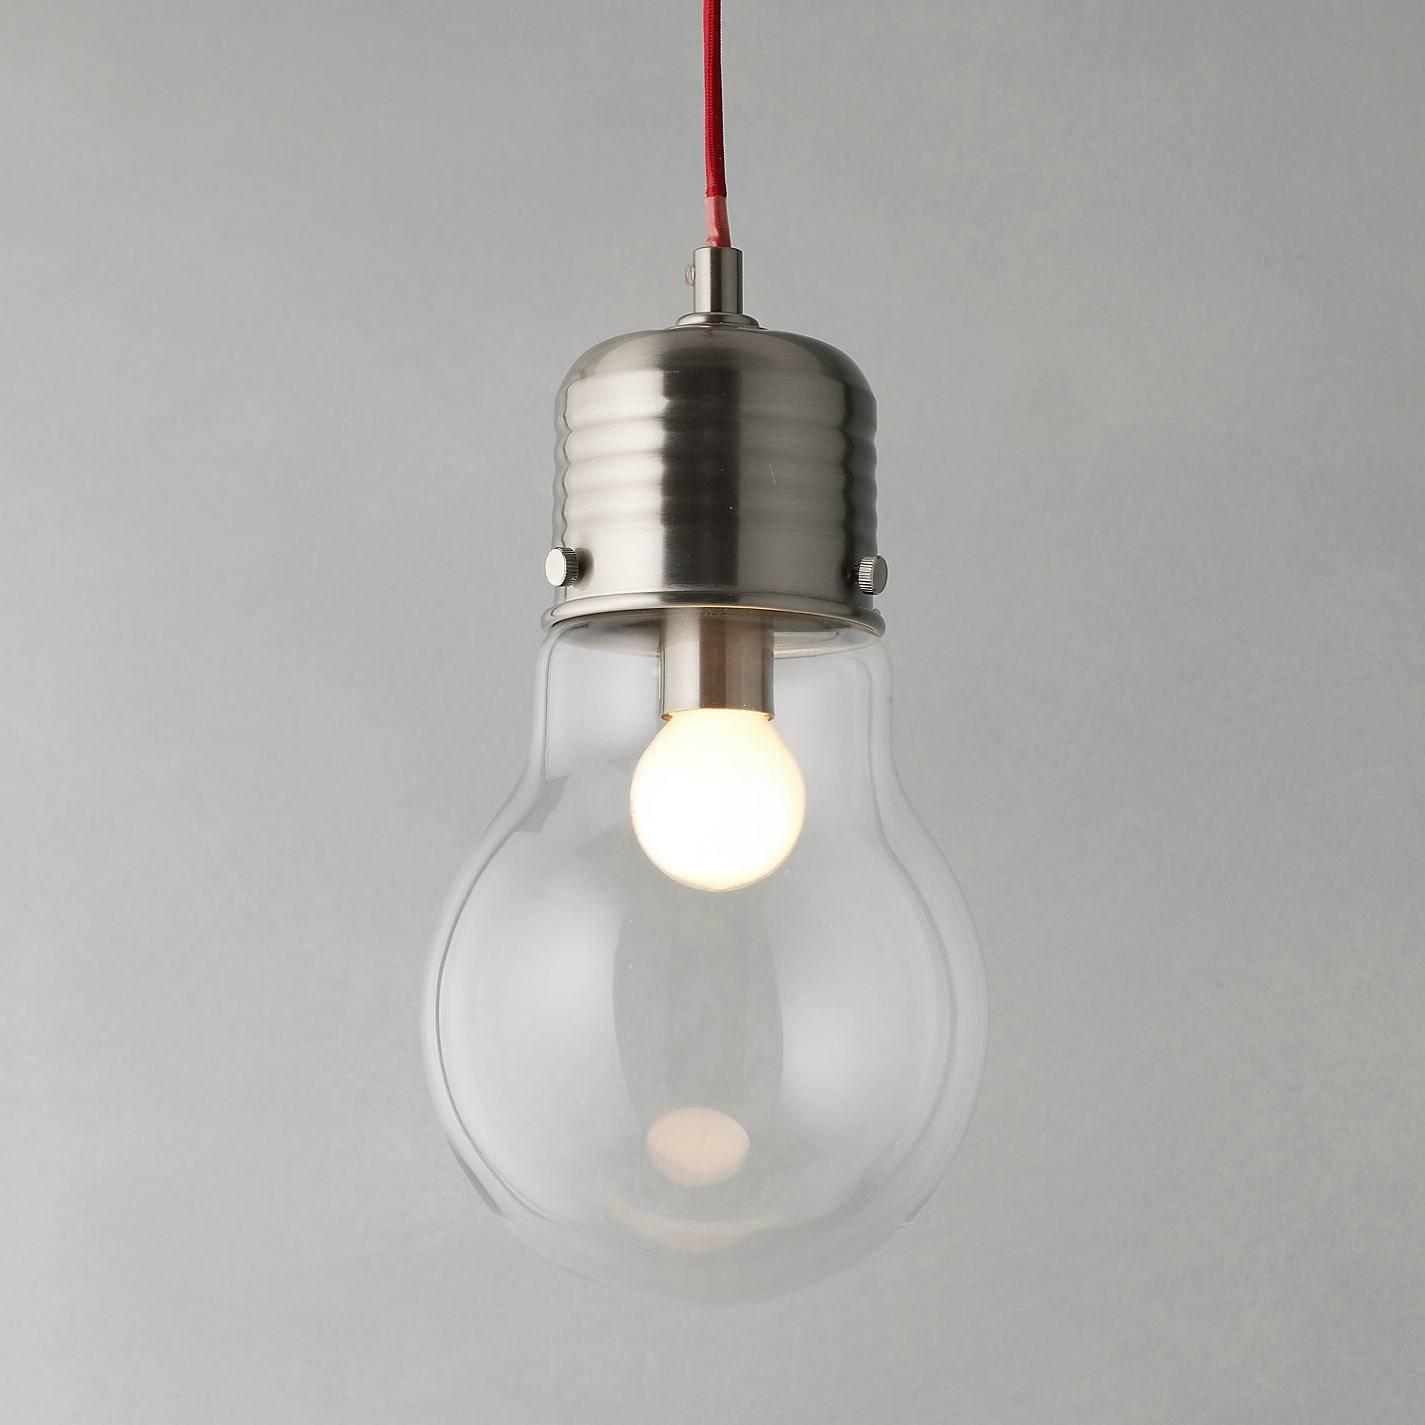 Amusing Light Bulb Pendant 71 On Ikea Pendant Lighting With Light in Giant Lights Bulb Pendants (Image 2 of 15)